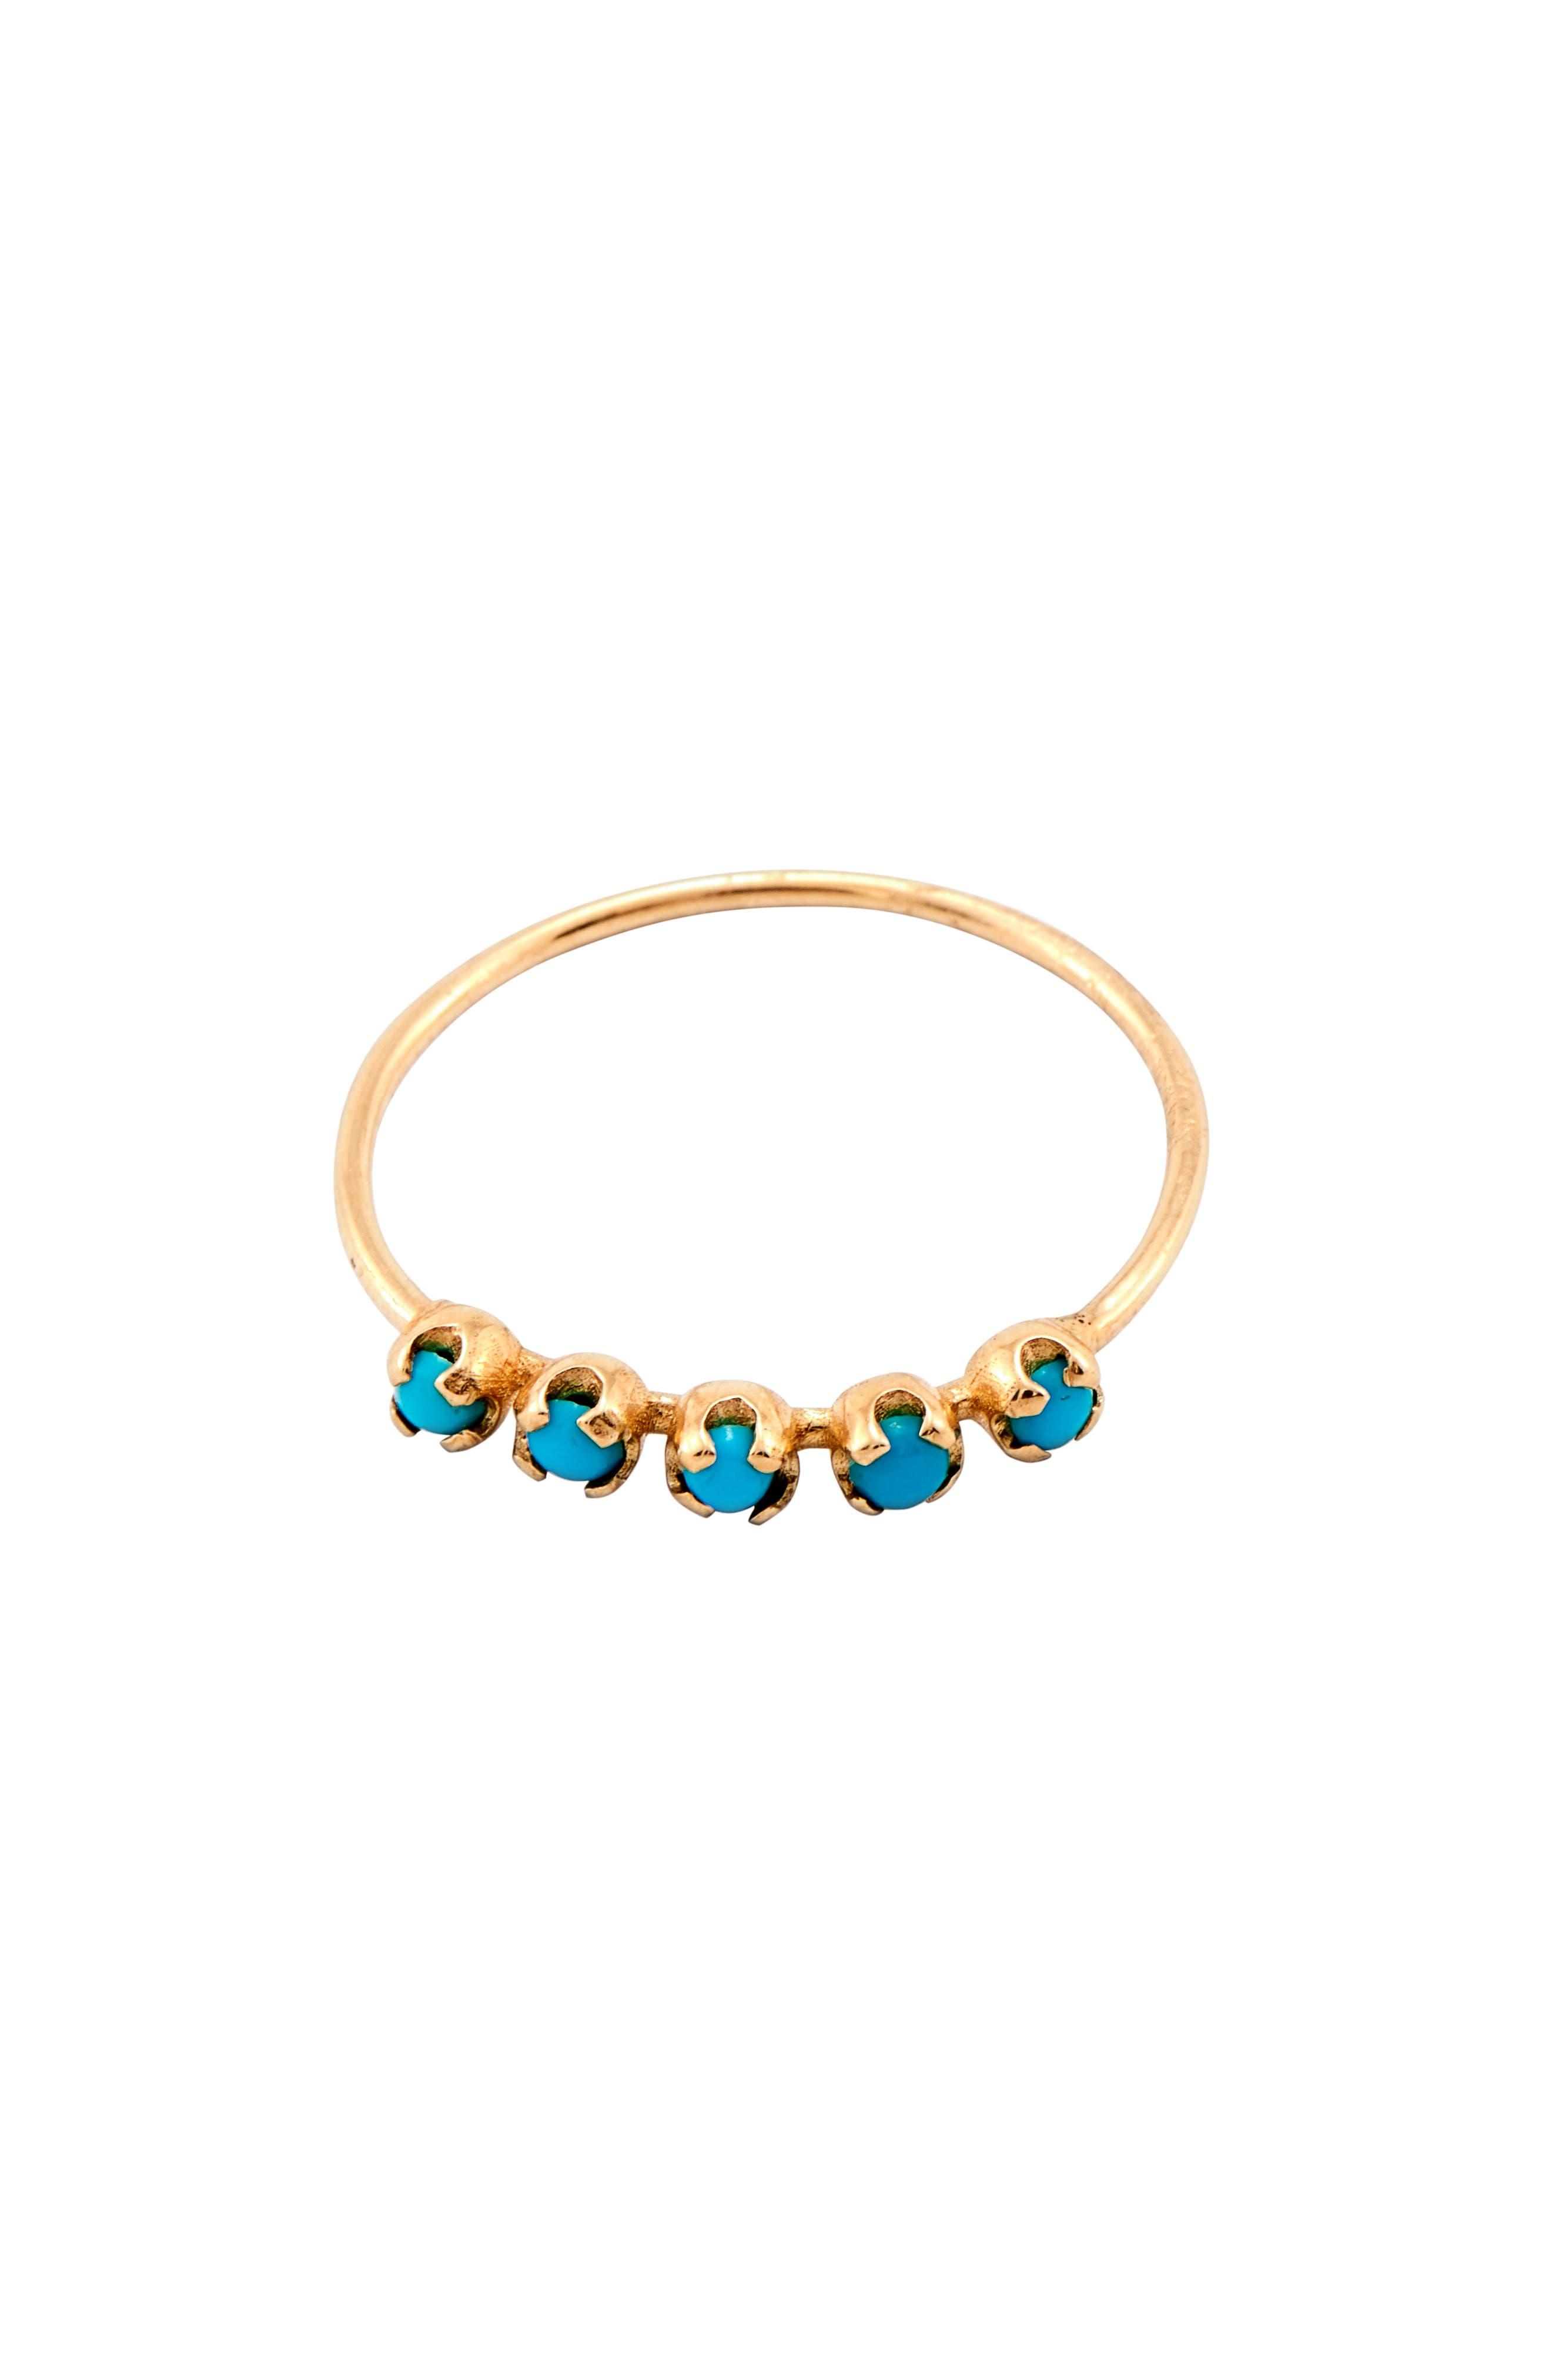 LOREN STEWART, Turquoise Cinq Ring, Main thumbnail 1, color, GOLD/ TURQUOISE